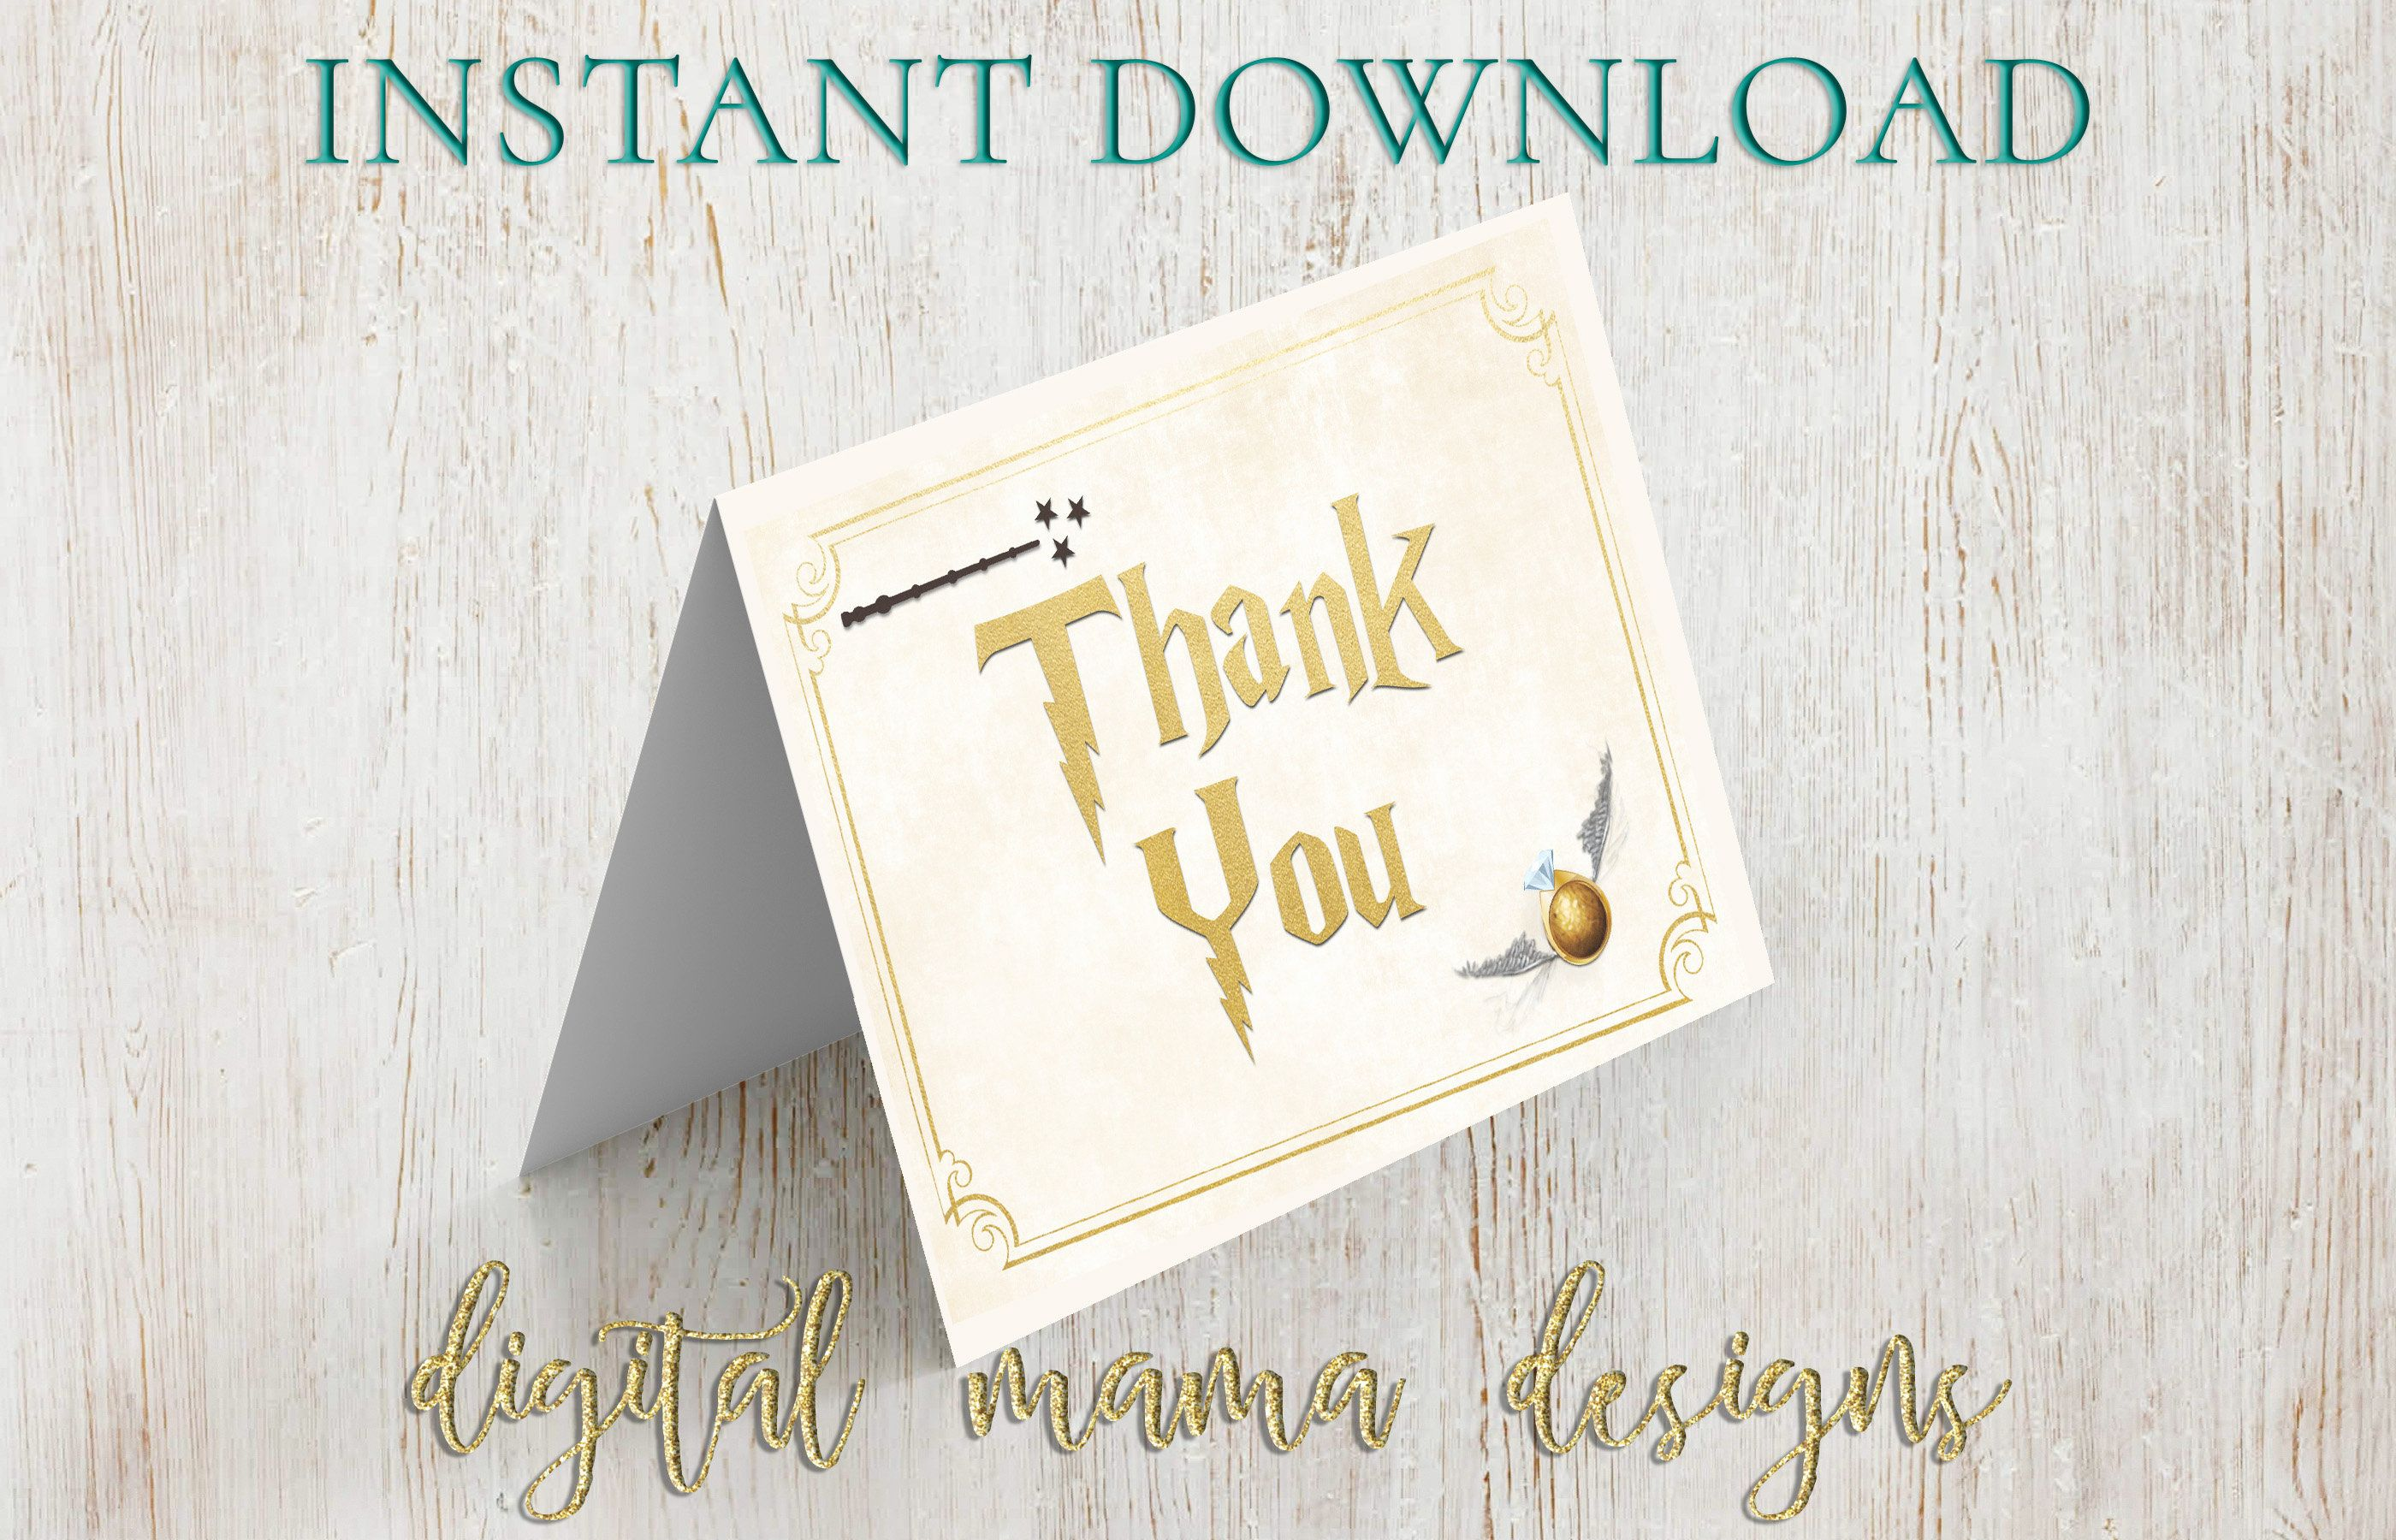 Instant download harry potter bridal shower thank you